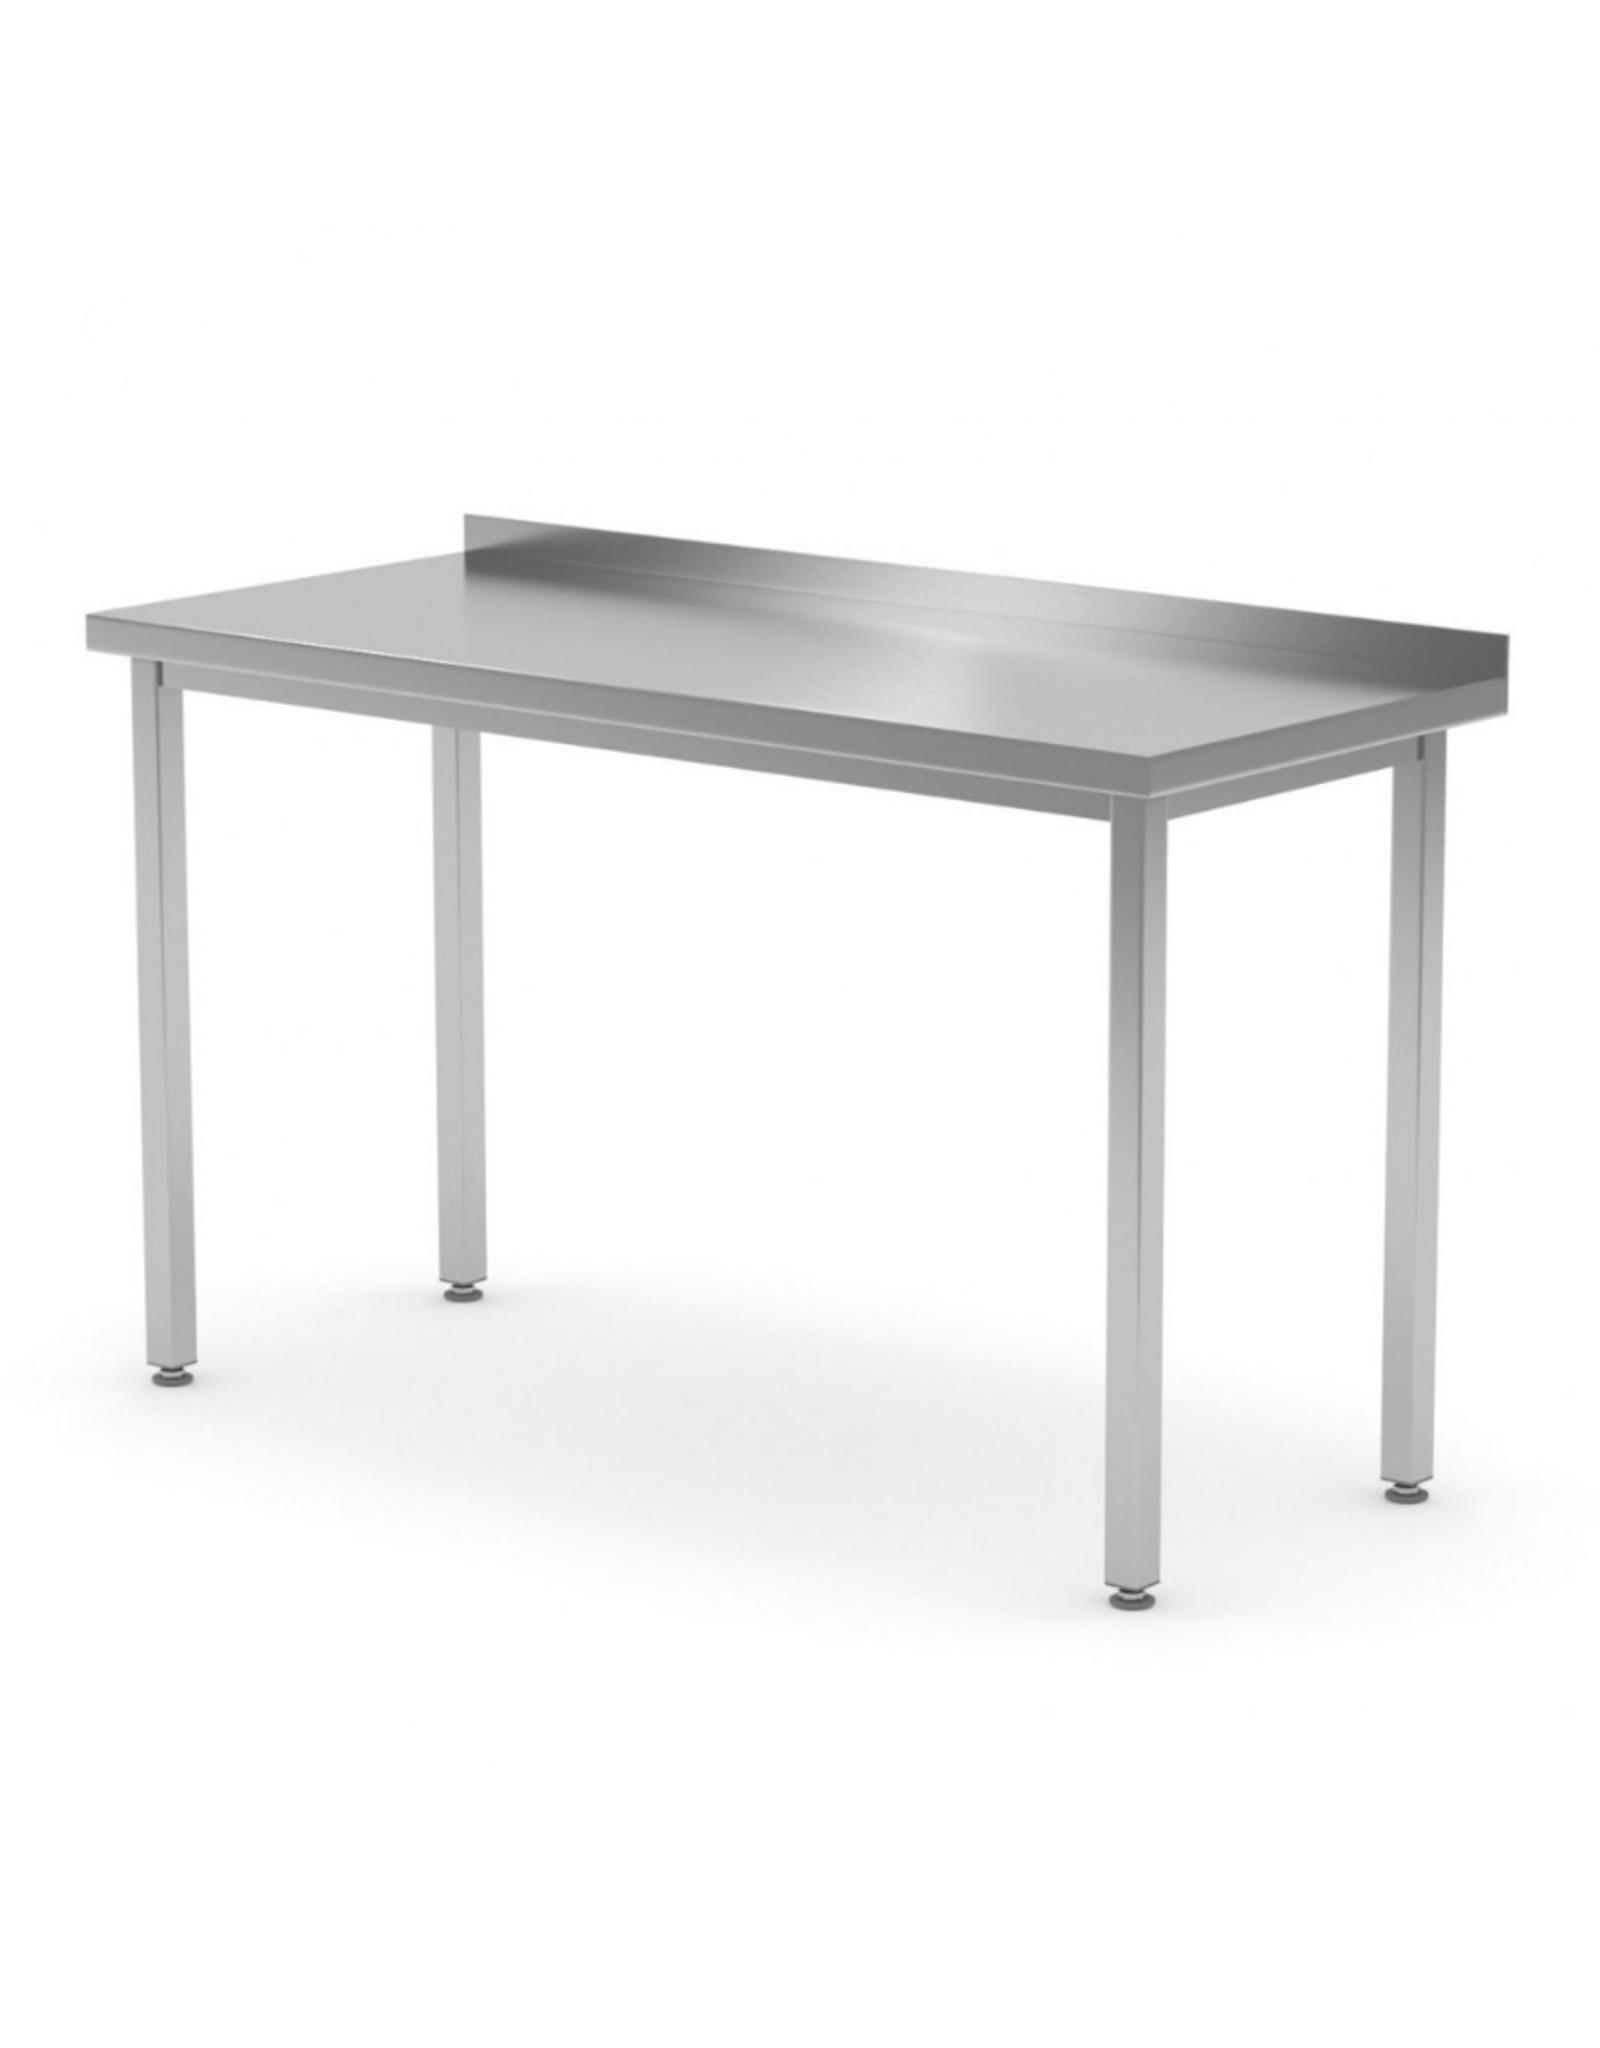 Werktafel met open onderkant | 400-1900mm breed | 600 of 700mm diep